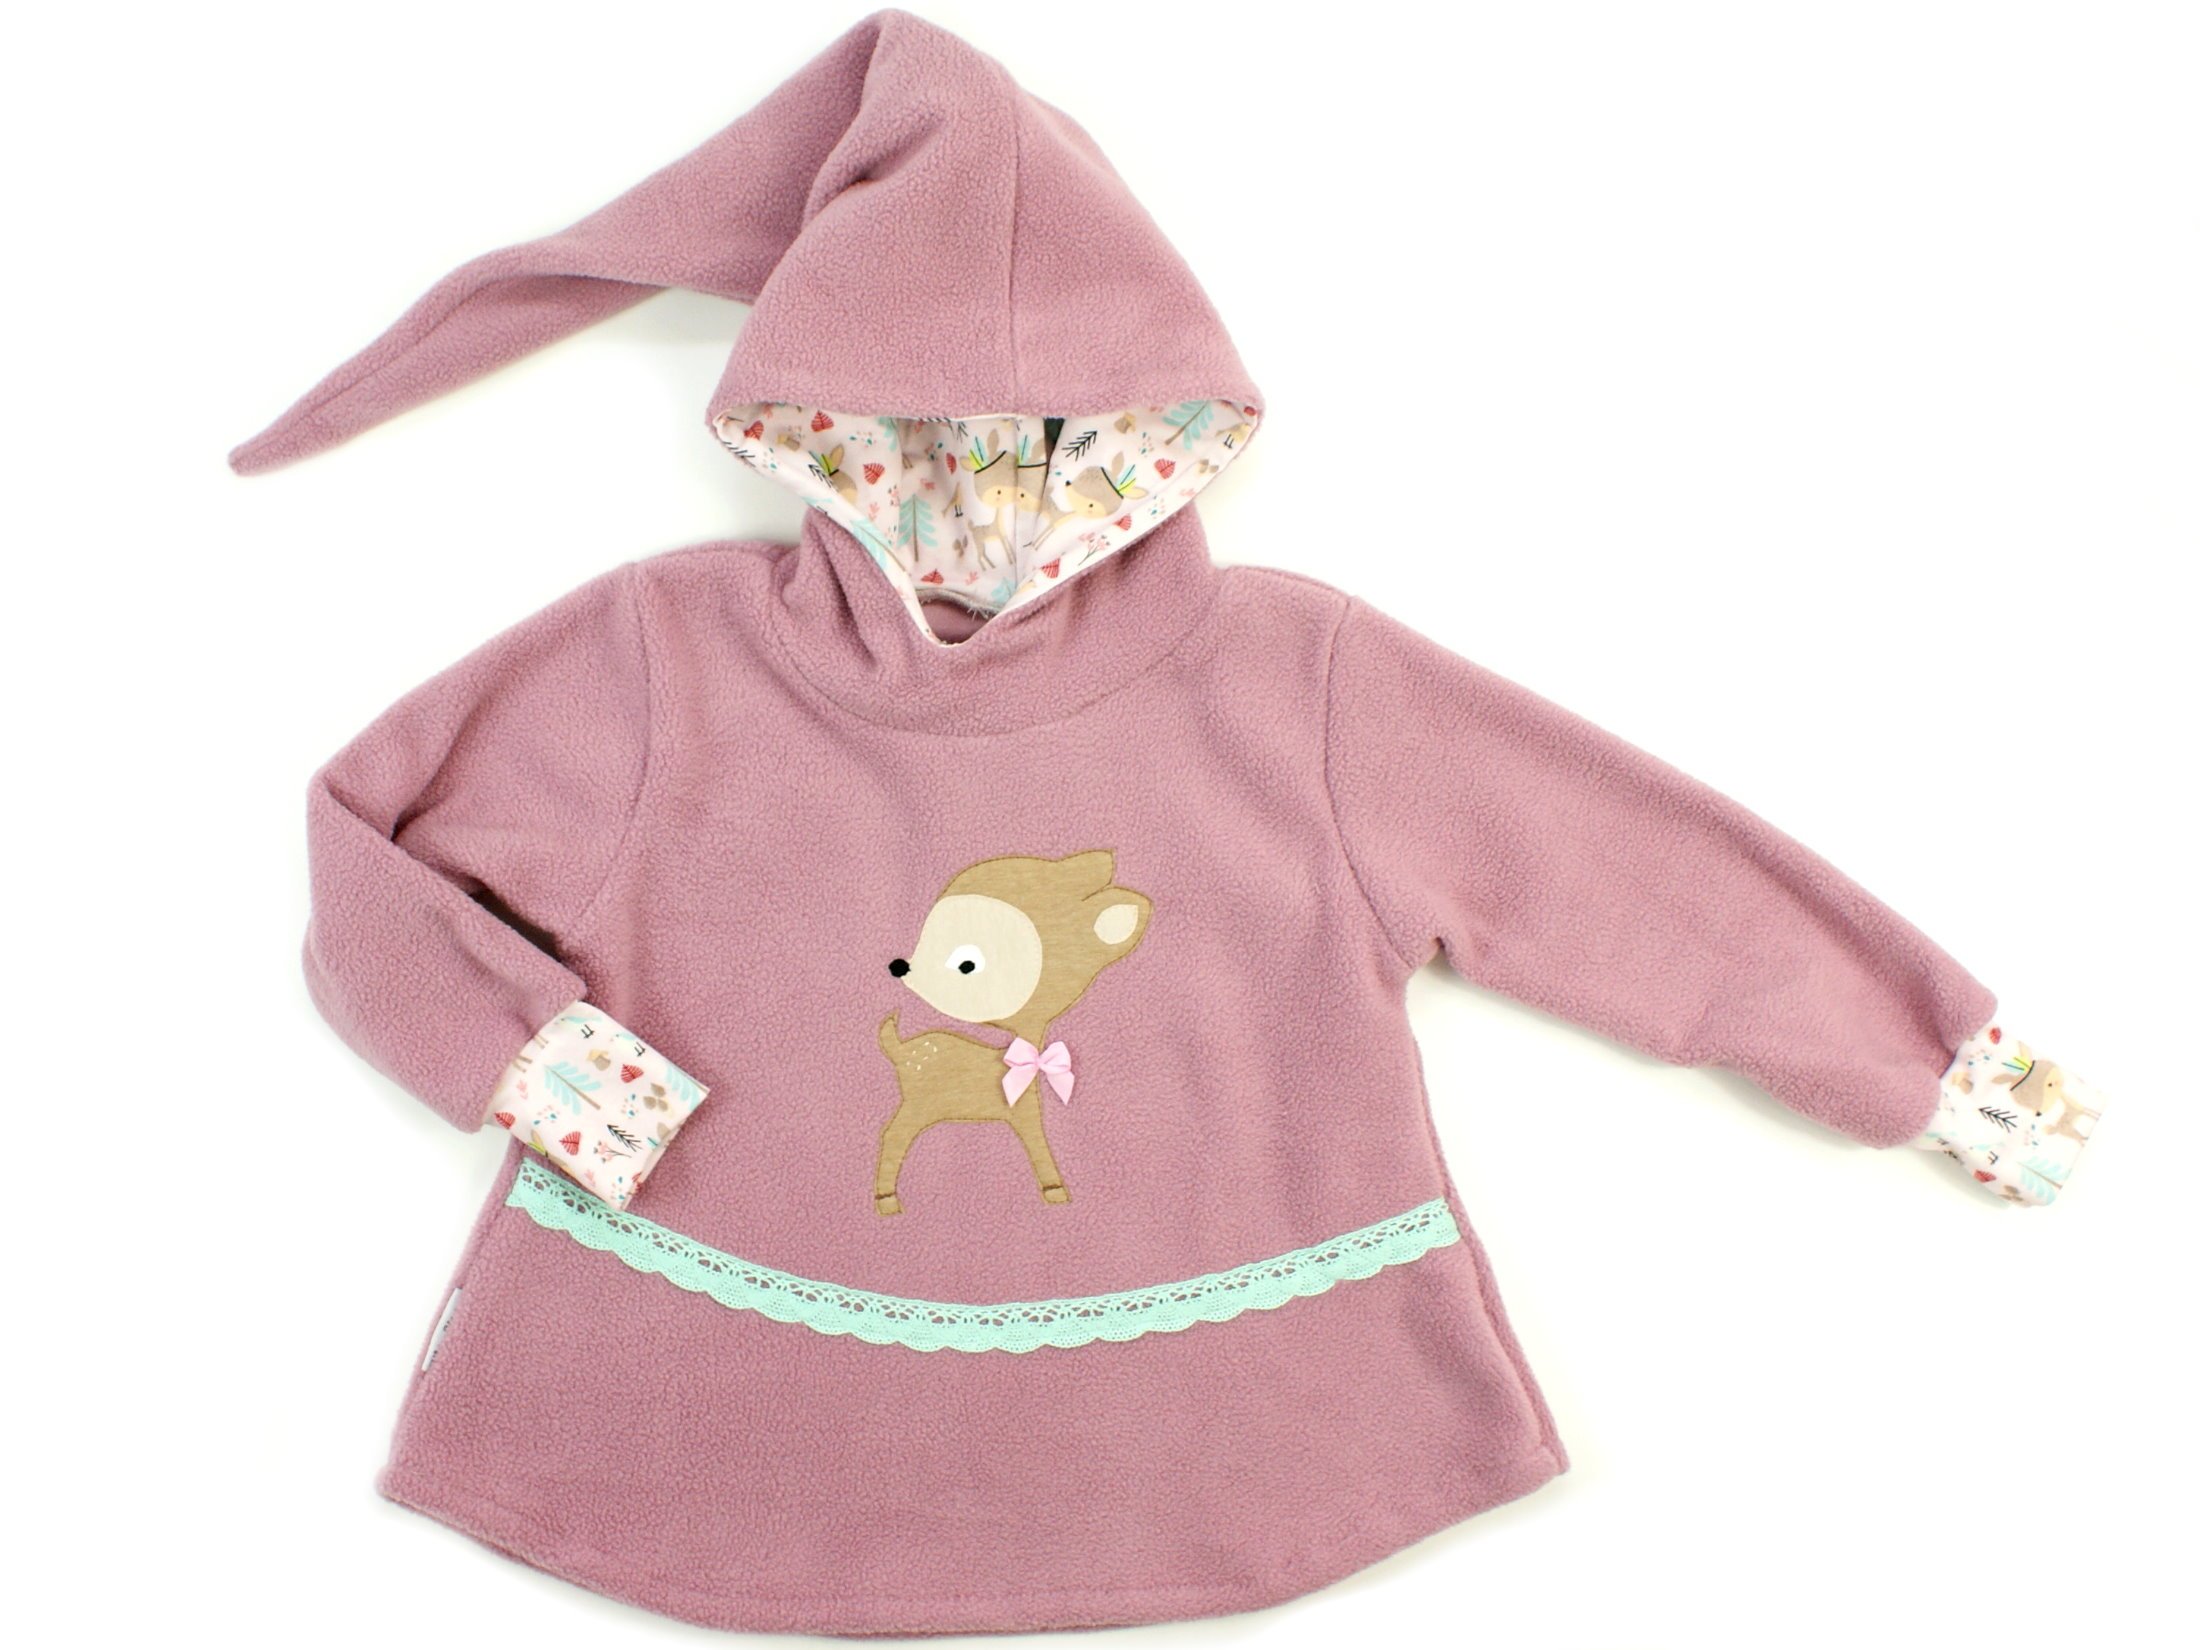 "Kinder Fleecepullover mit Zipfelkapuze Boho ""Reh"" beige rosa"